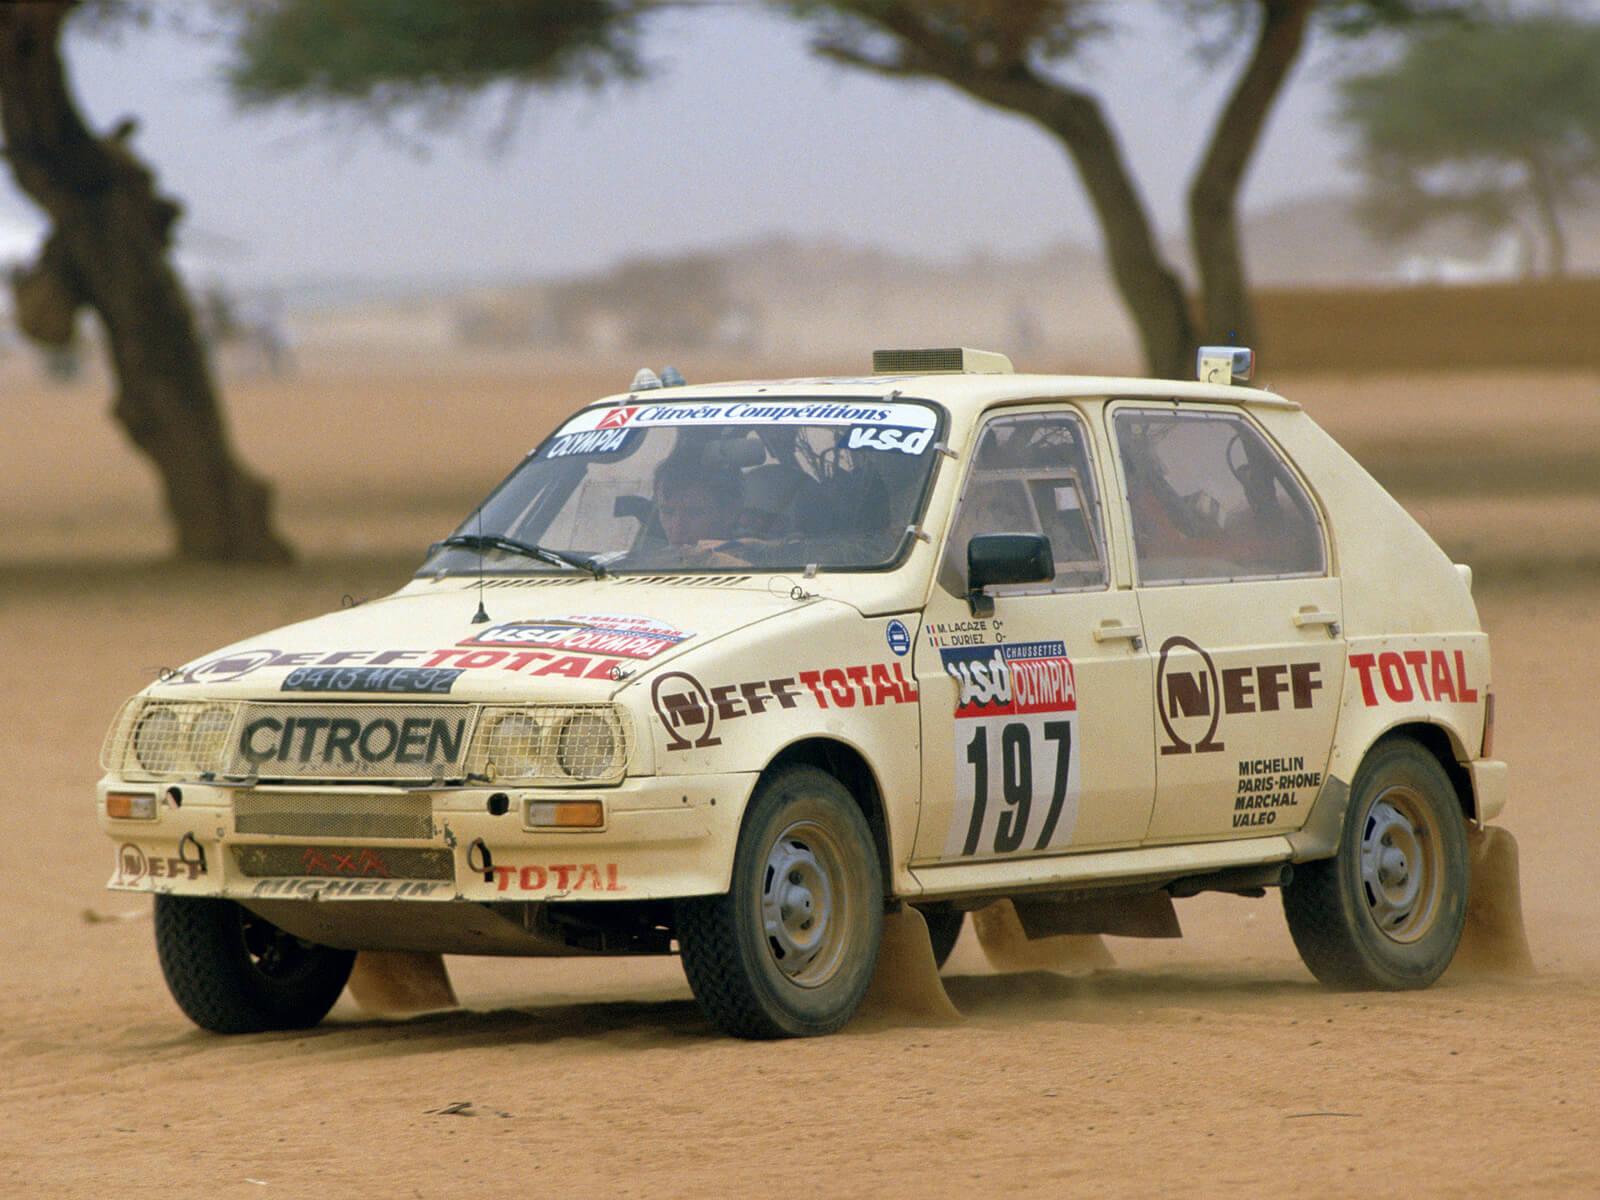 Citroën Visa Dakar